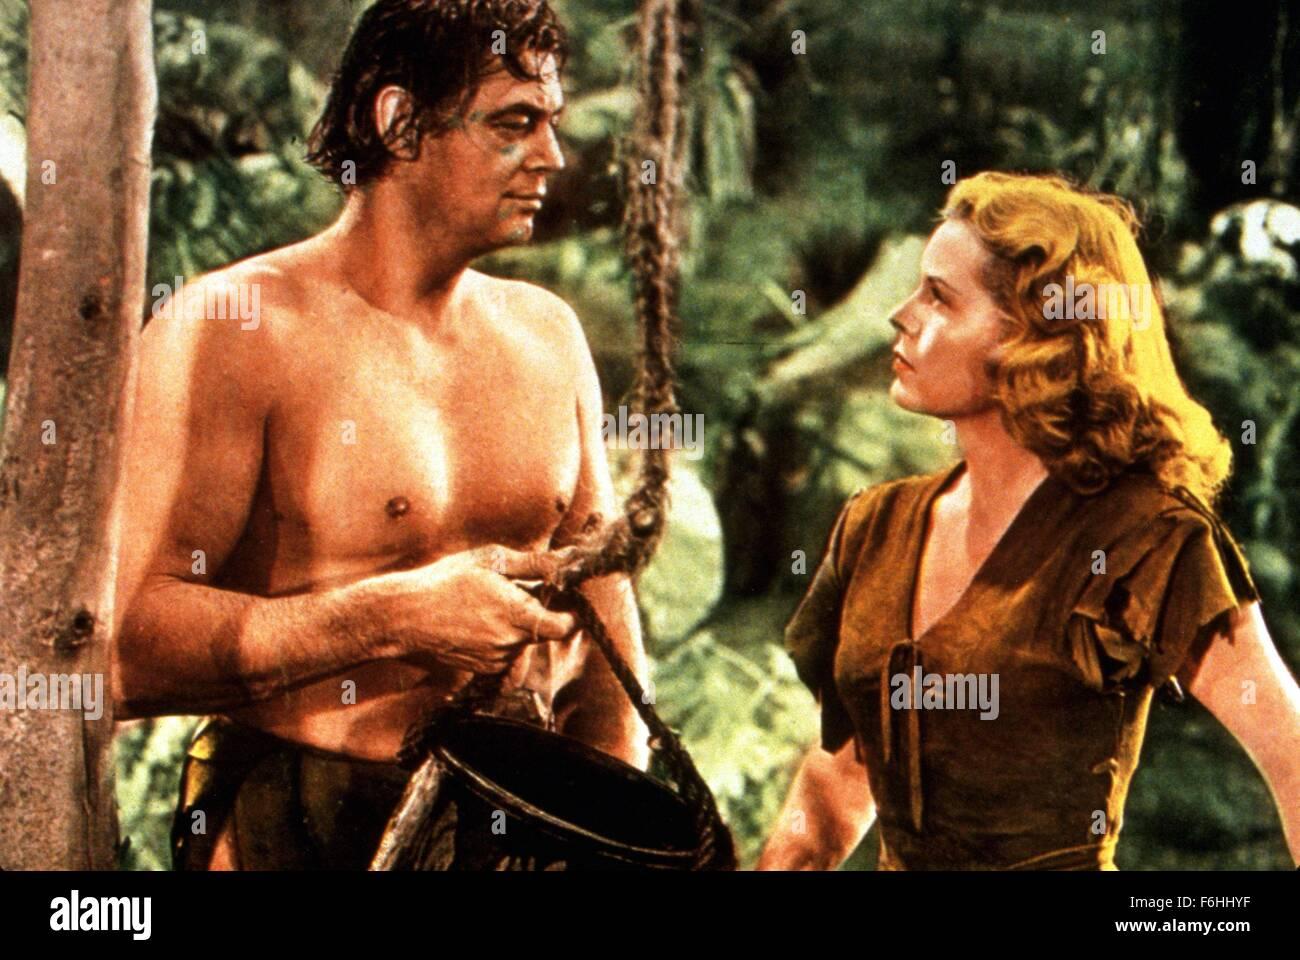 1945, Film Title: TARZAN AND THE AMAZONS, Director: KURT